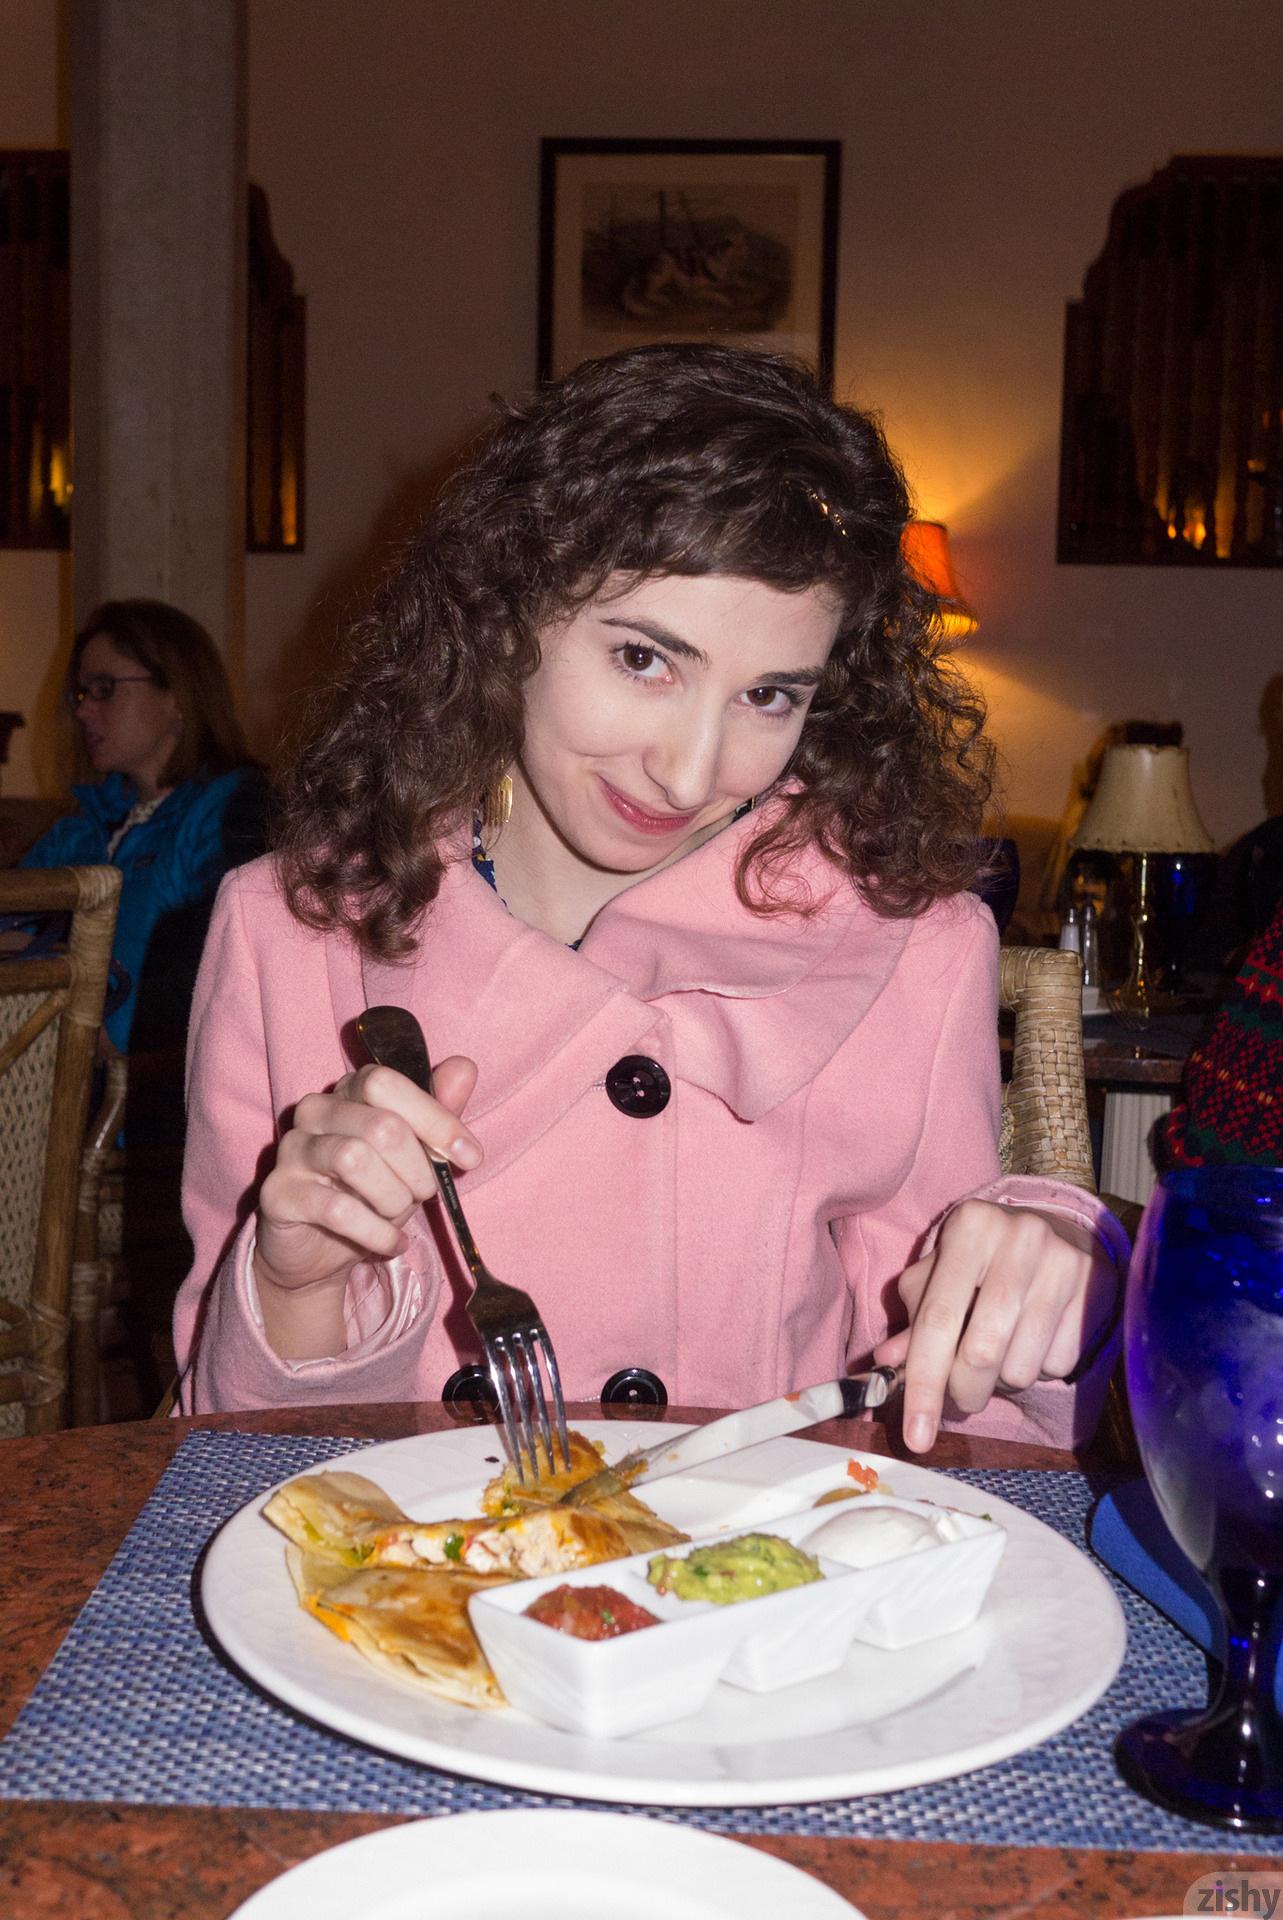 Yvette Nolot At Arizona Inn Zishy (4)